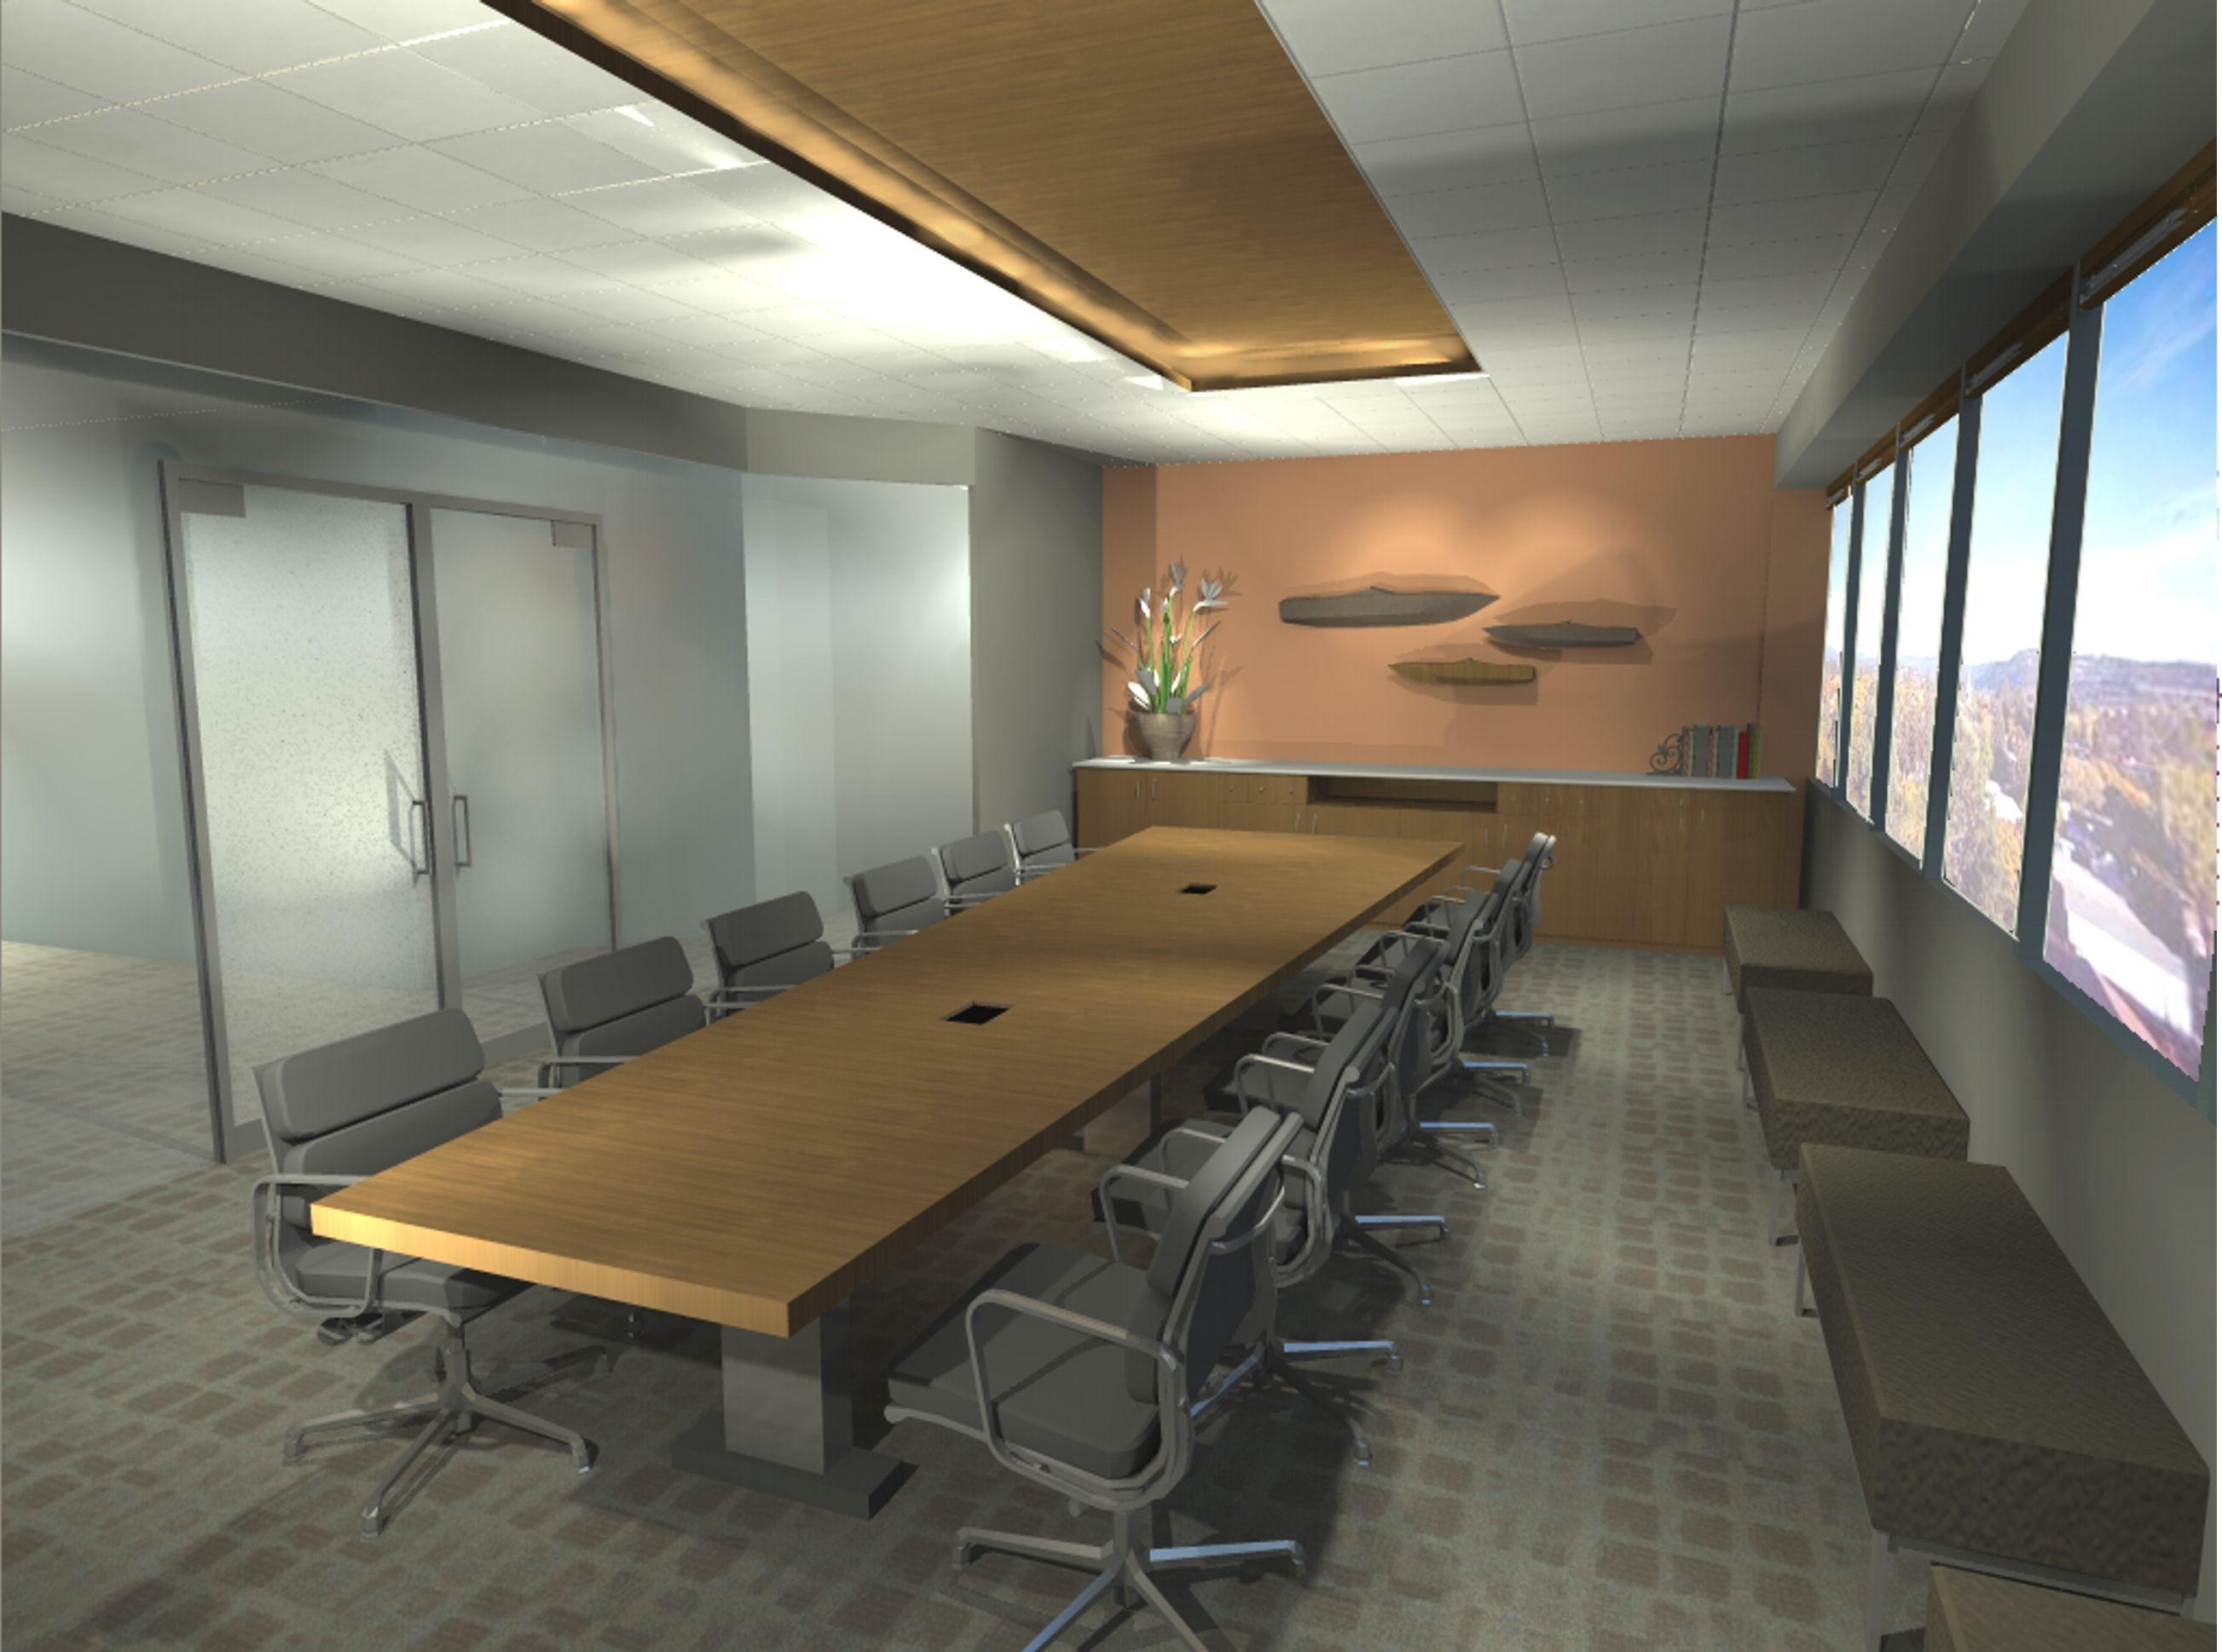 new office design. Ofice Designs   DLBA Office Project - New Design In Chesapeake